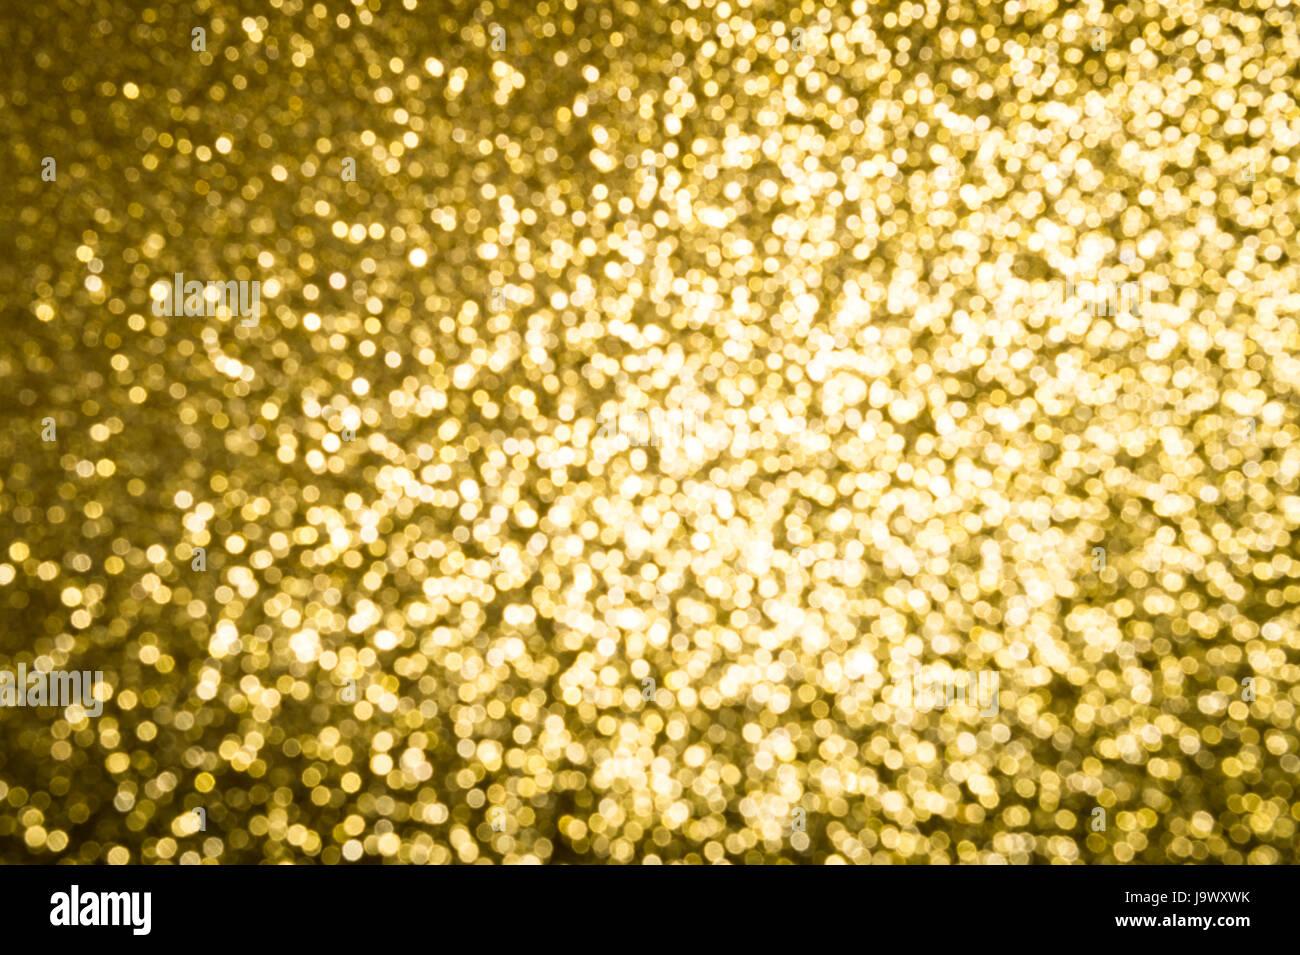 Abstrakter Hintergrund gold Glitter glänzend in unscharf gestellt Bokeh unter hellem Licht Stockbild